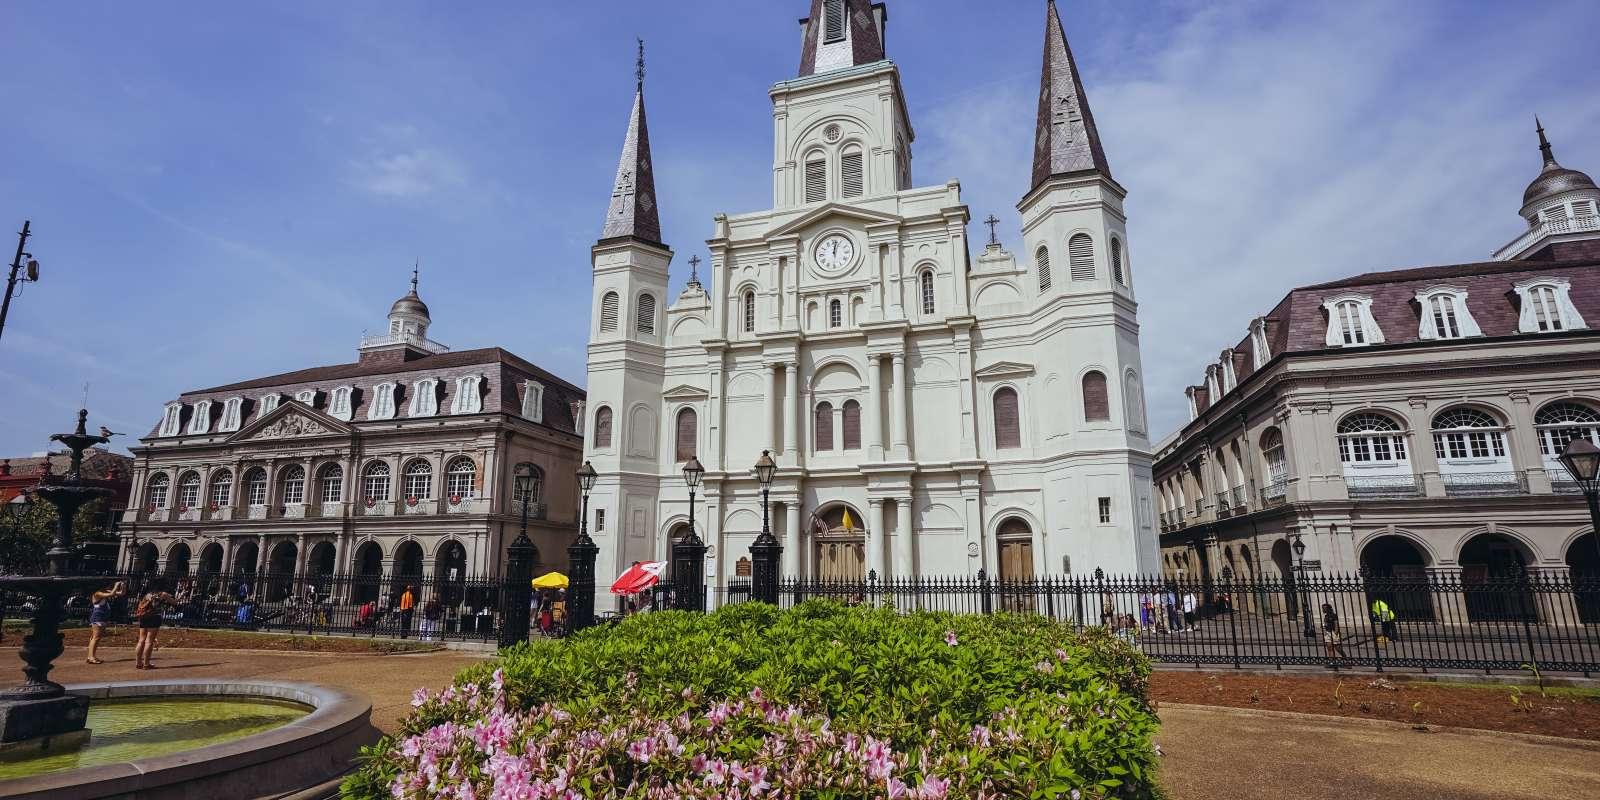 Jackson Square - St. Louis Cathedral - Springtime